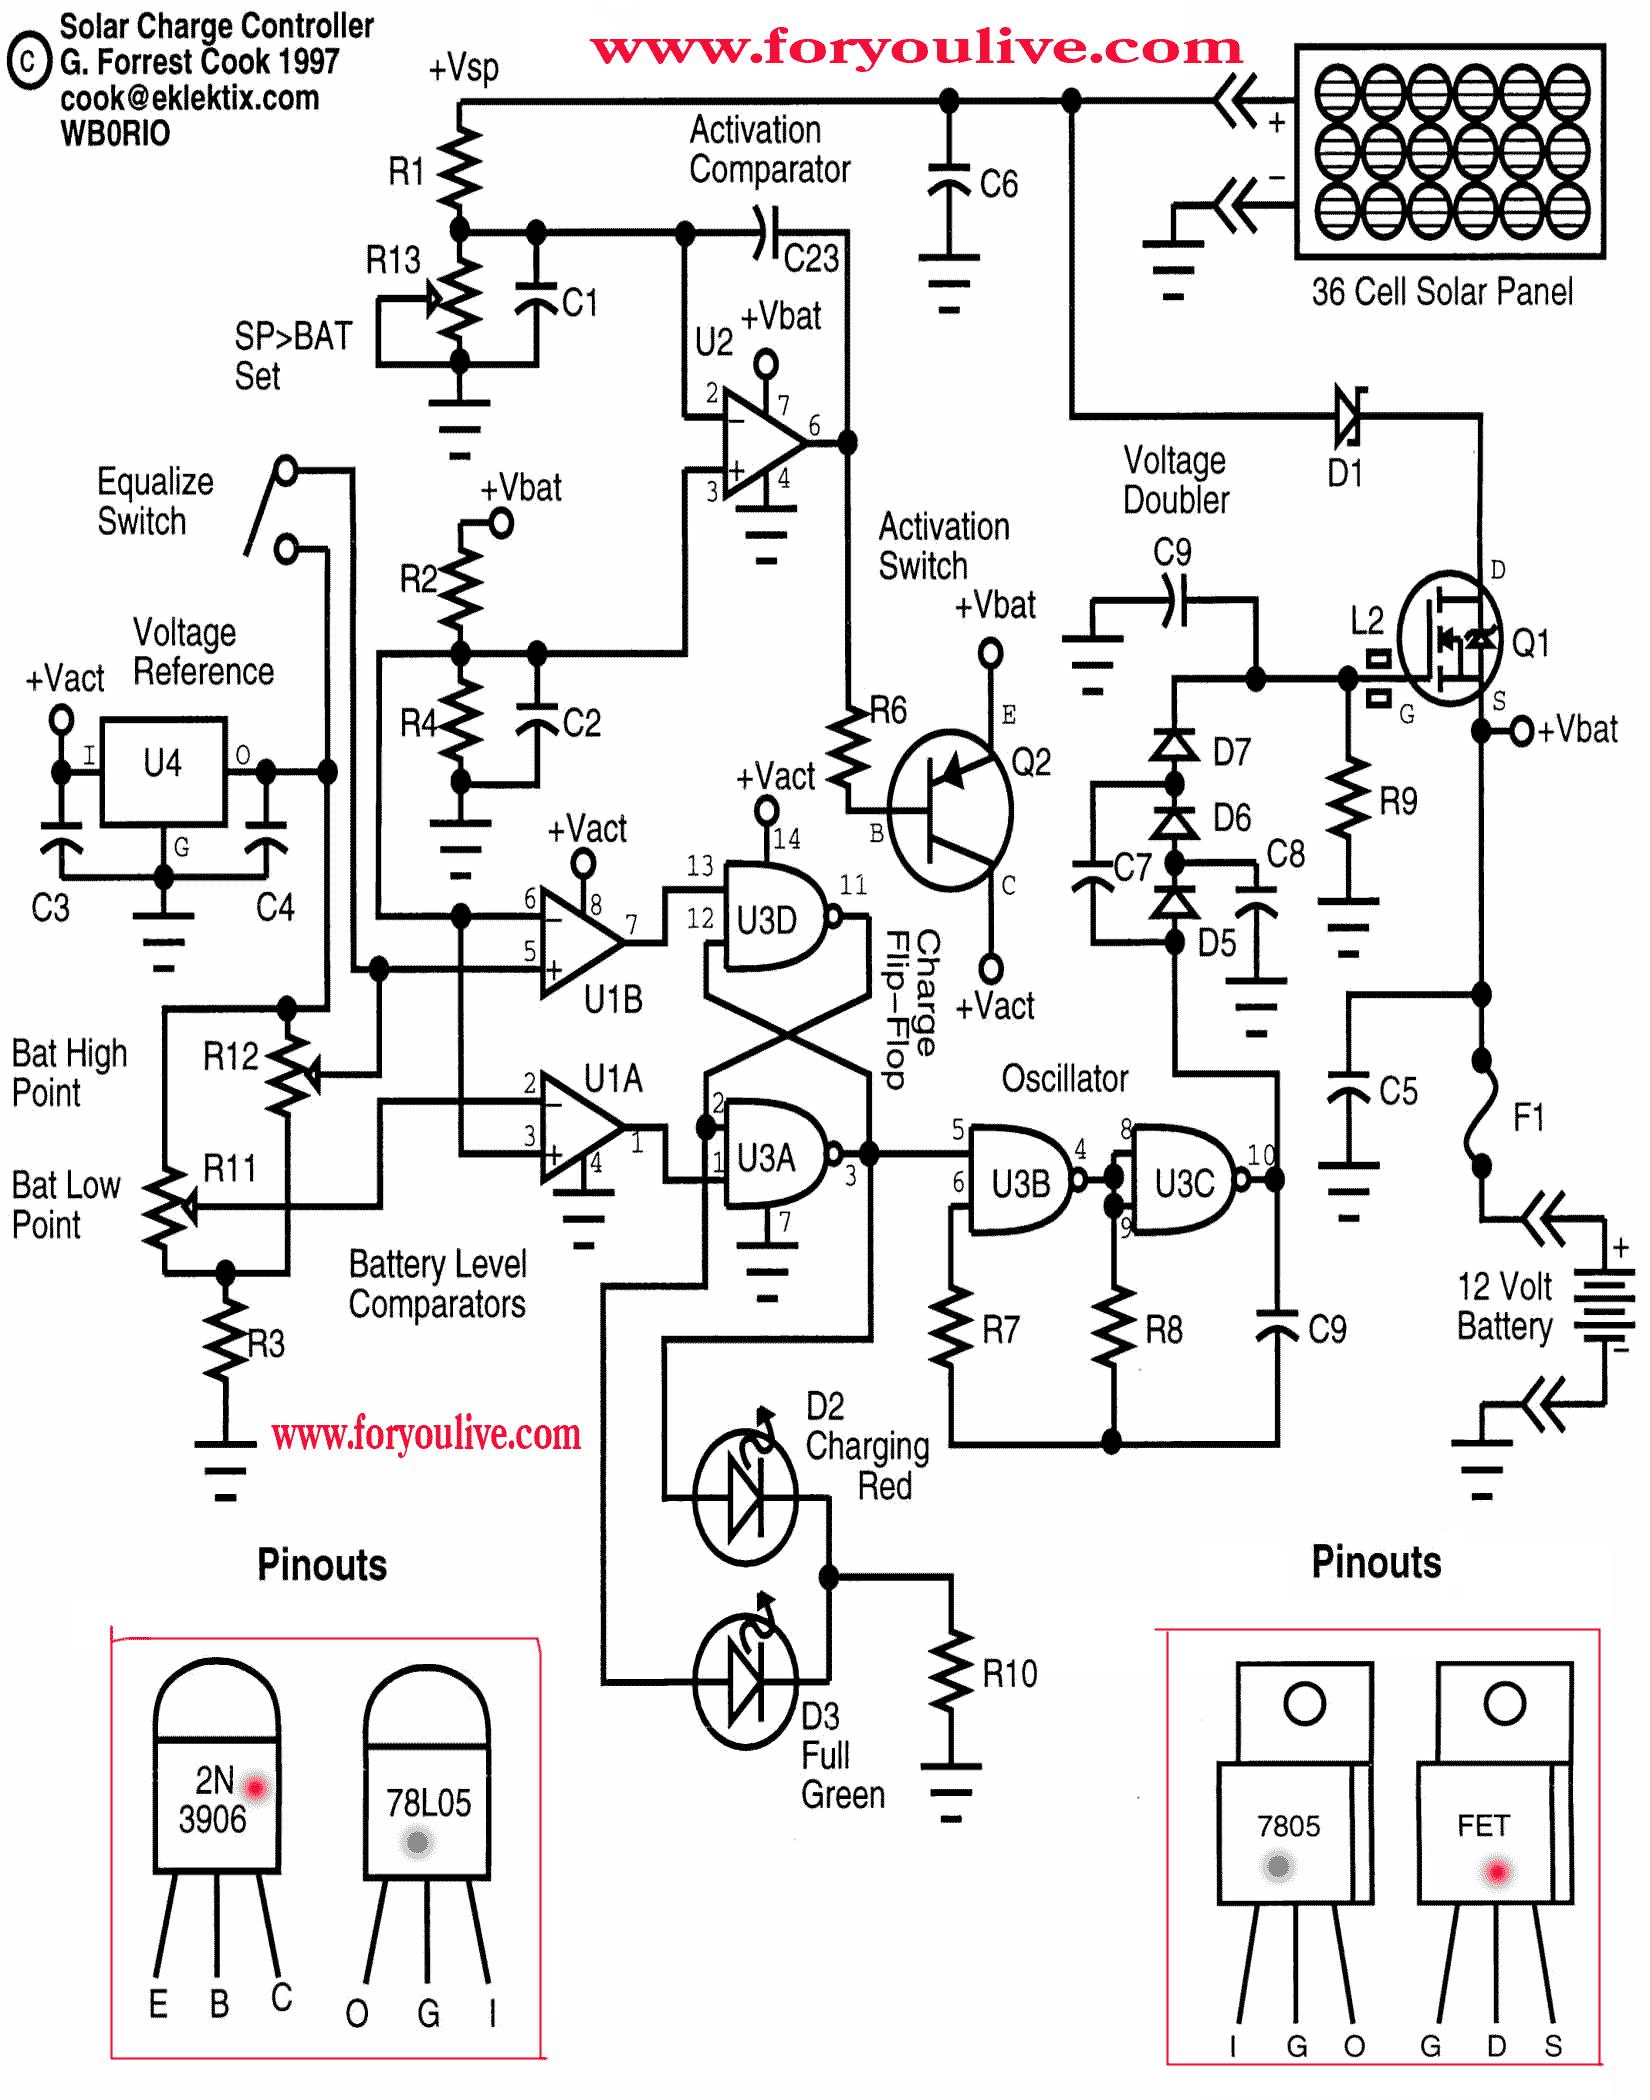 Solar Panel Circuit 5volt Regulate Voltage 2n Is